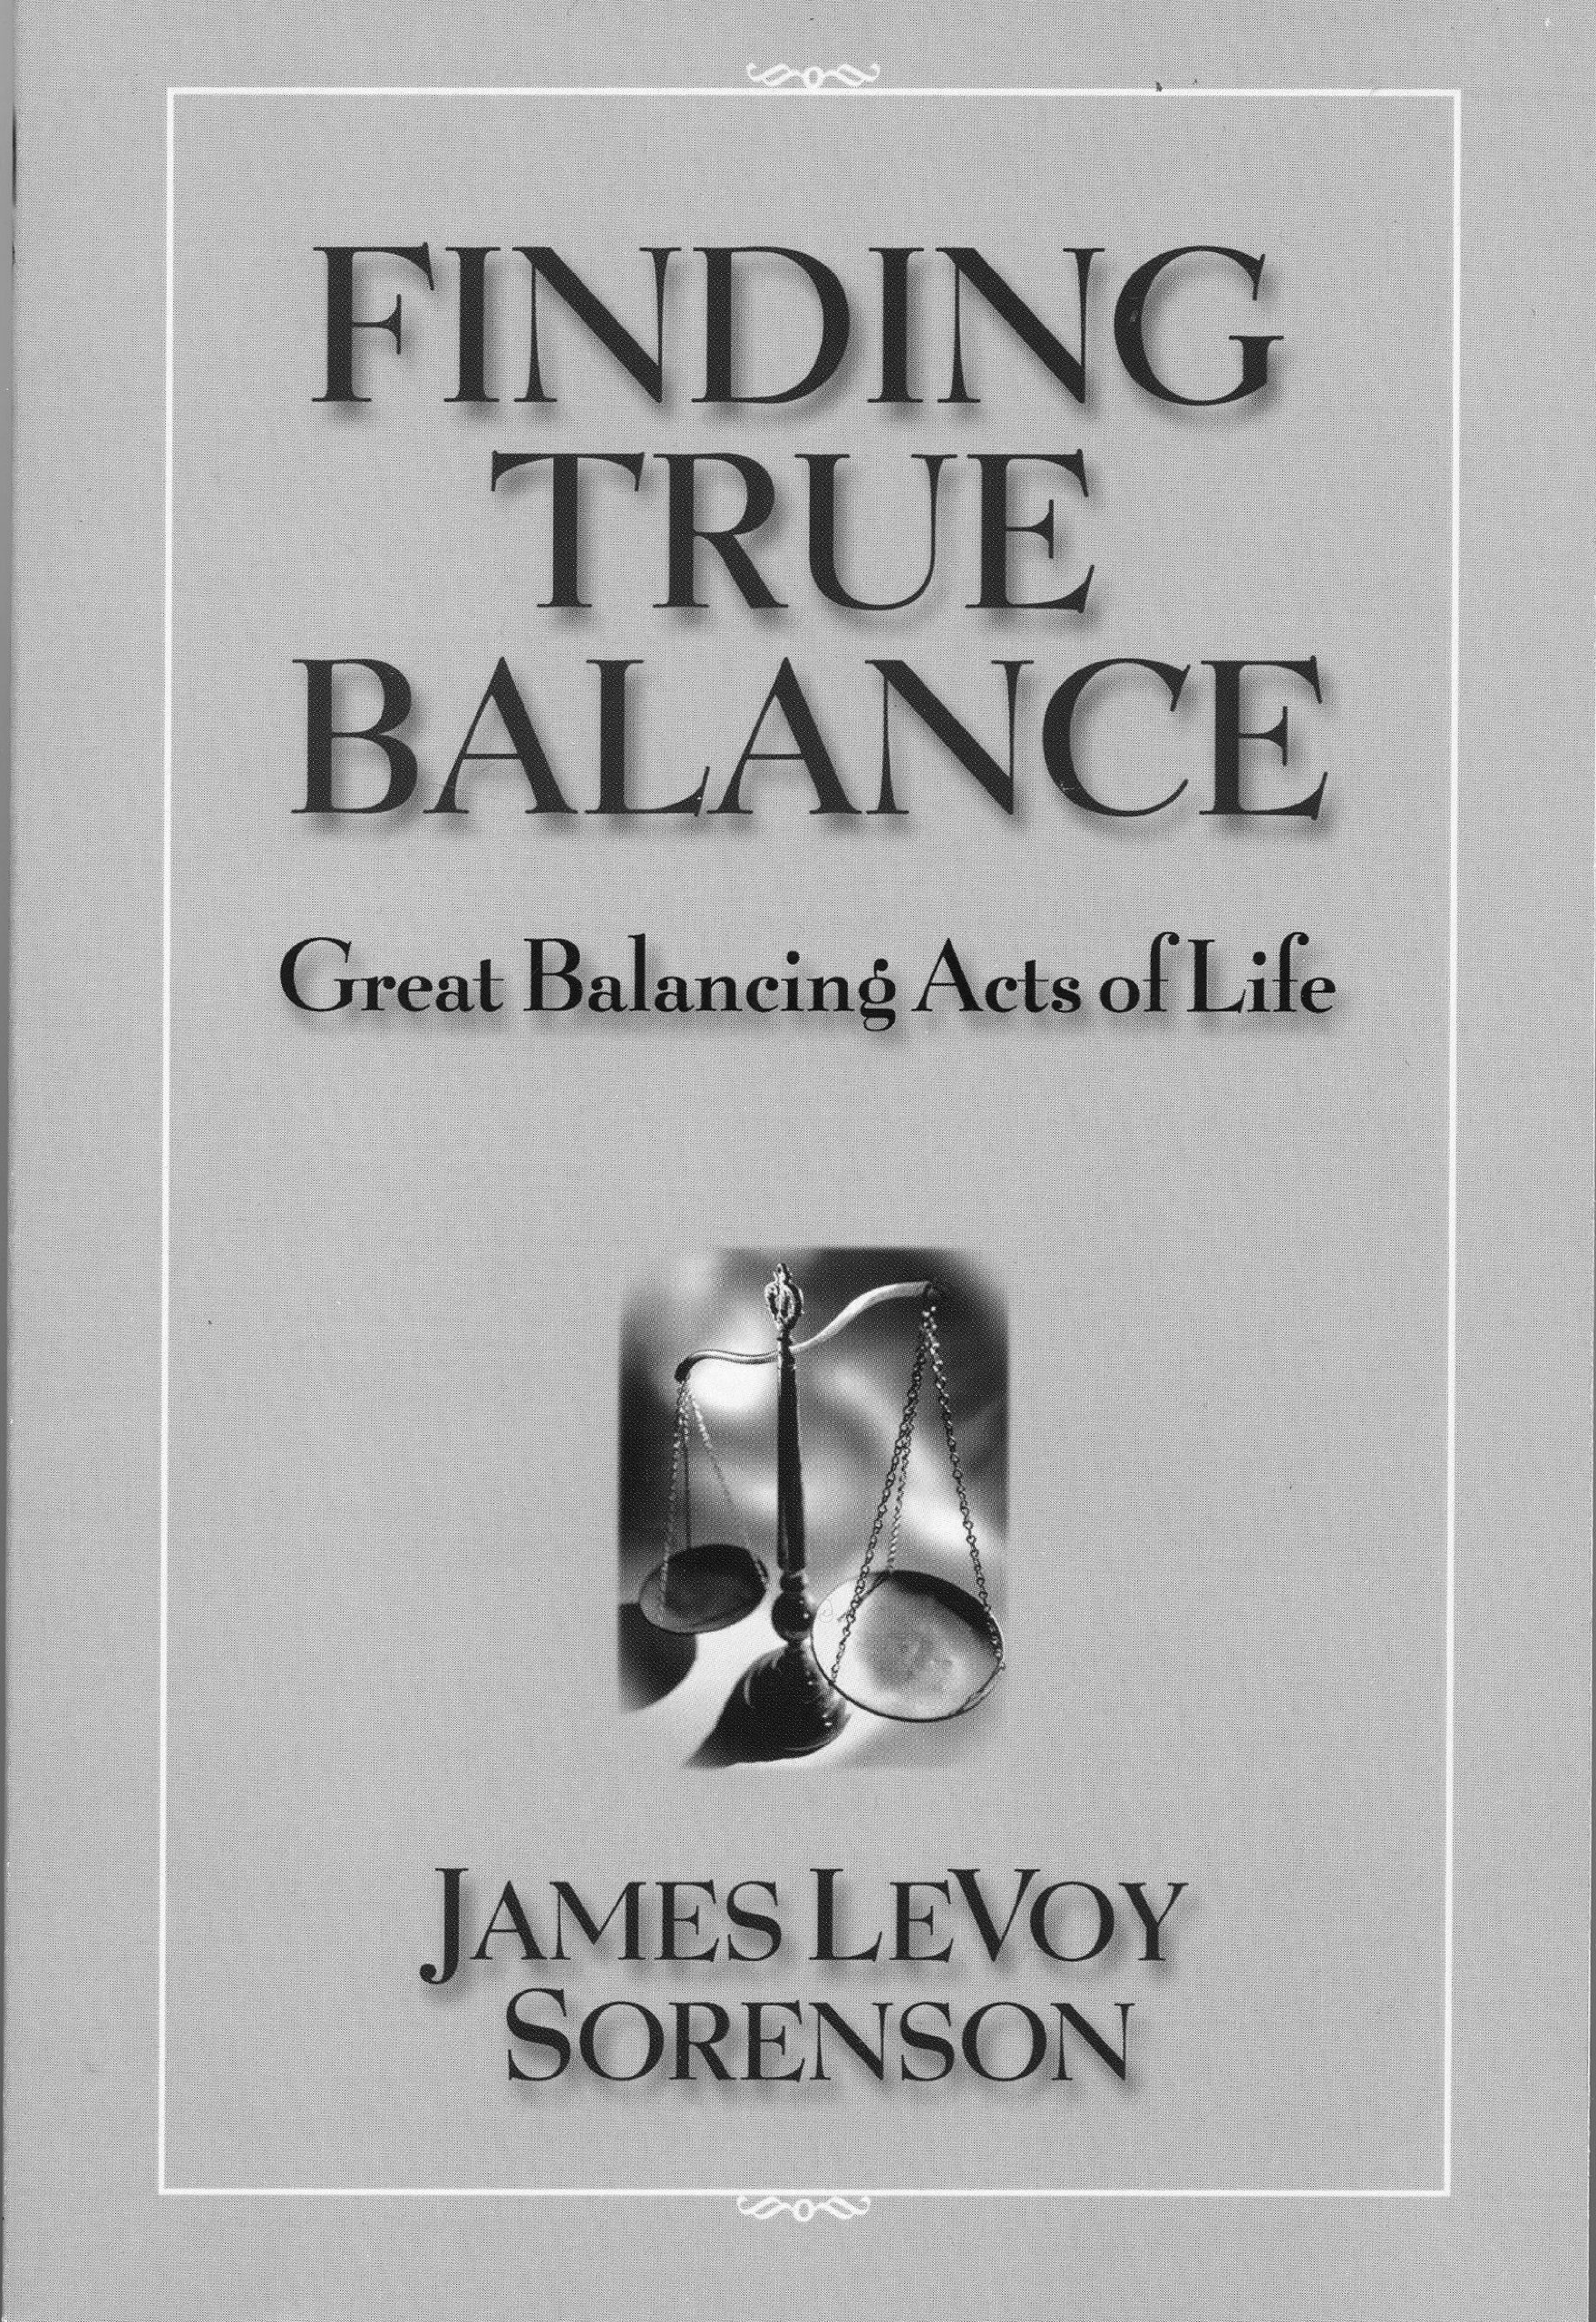 Finding True Balance